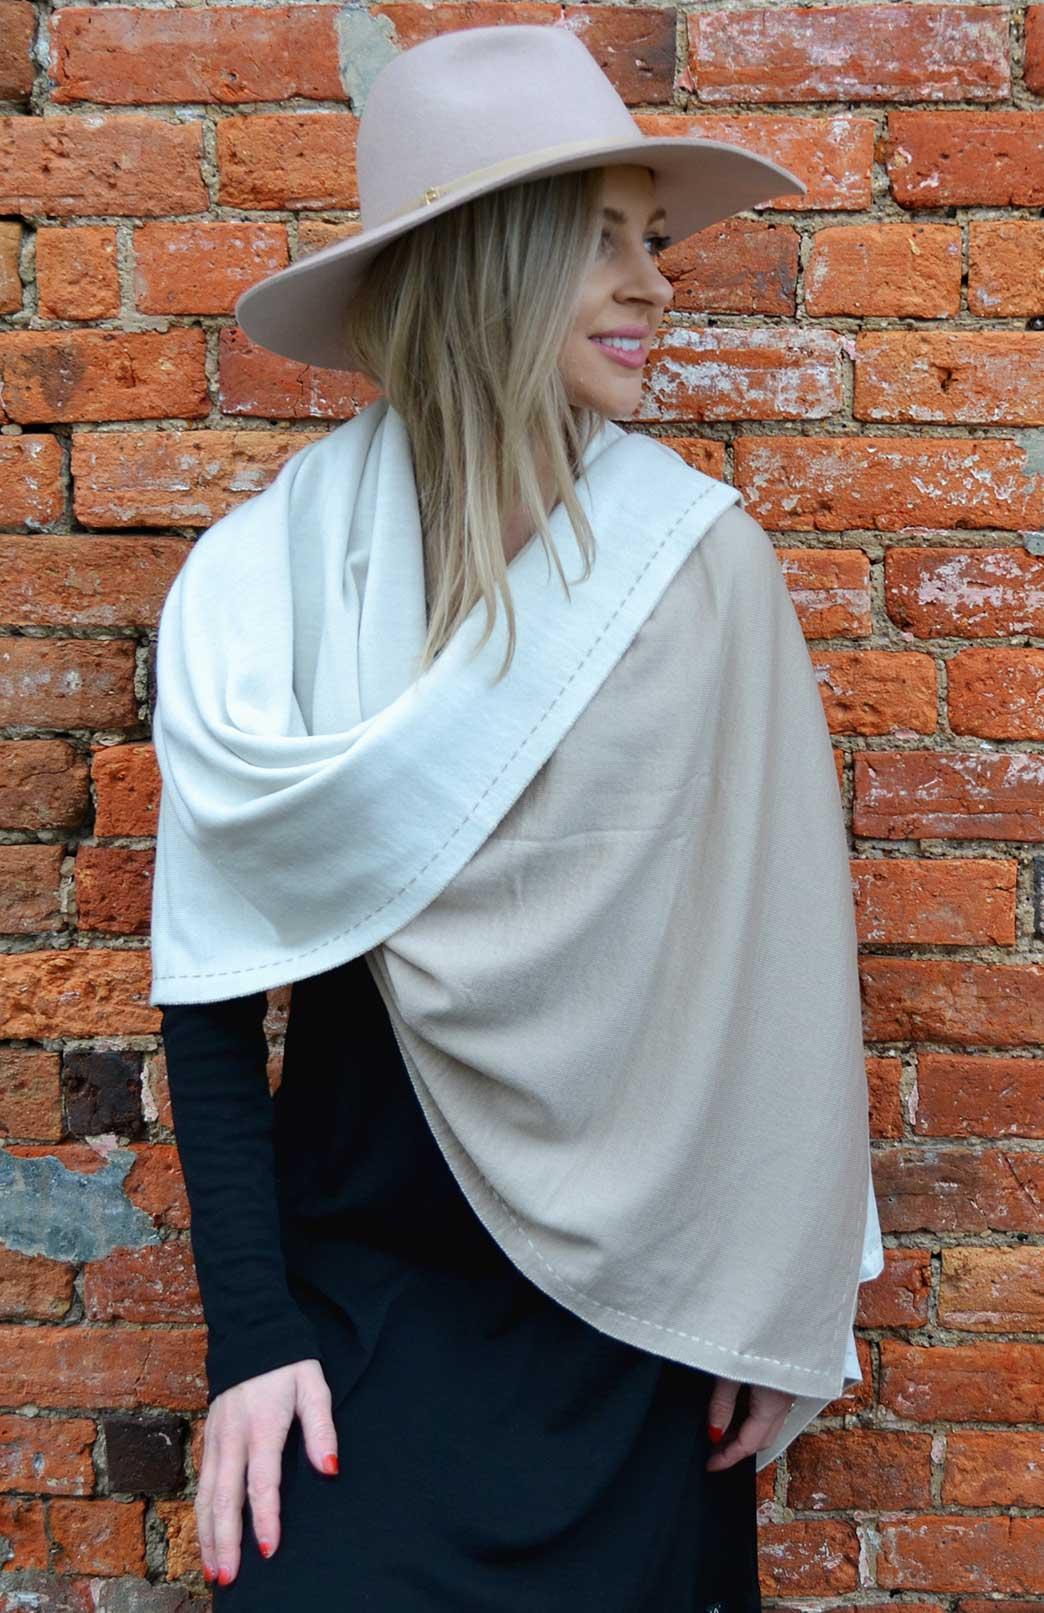 Reversible Wrap - Women's Natural Cream and Oatmeal Superfine Merino Wool Reversible Wrap and Knee Blanket - Smitten Merino Tasmania Australia